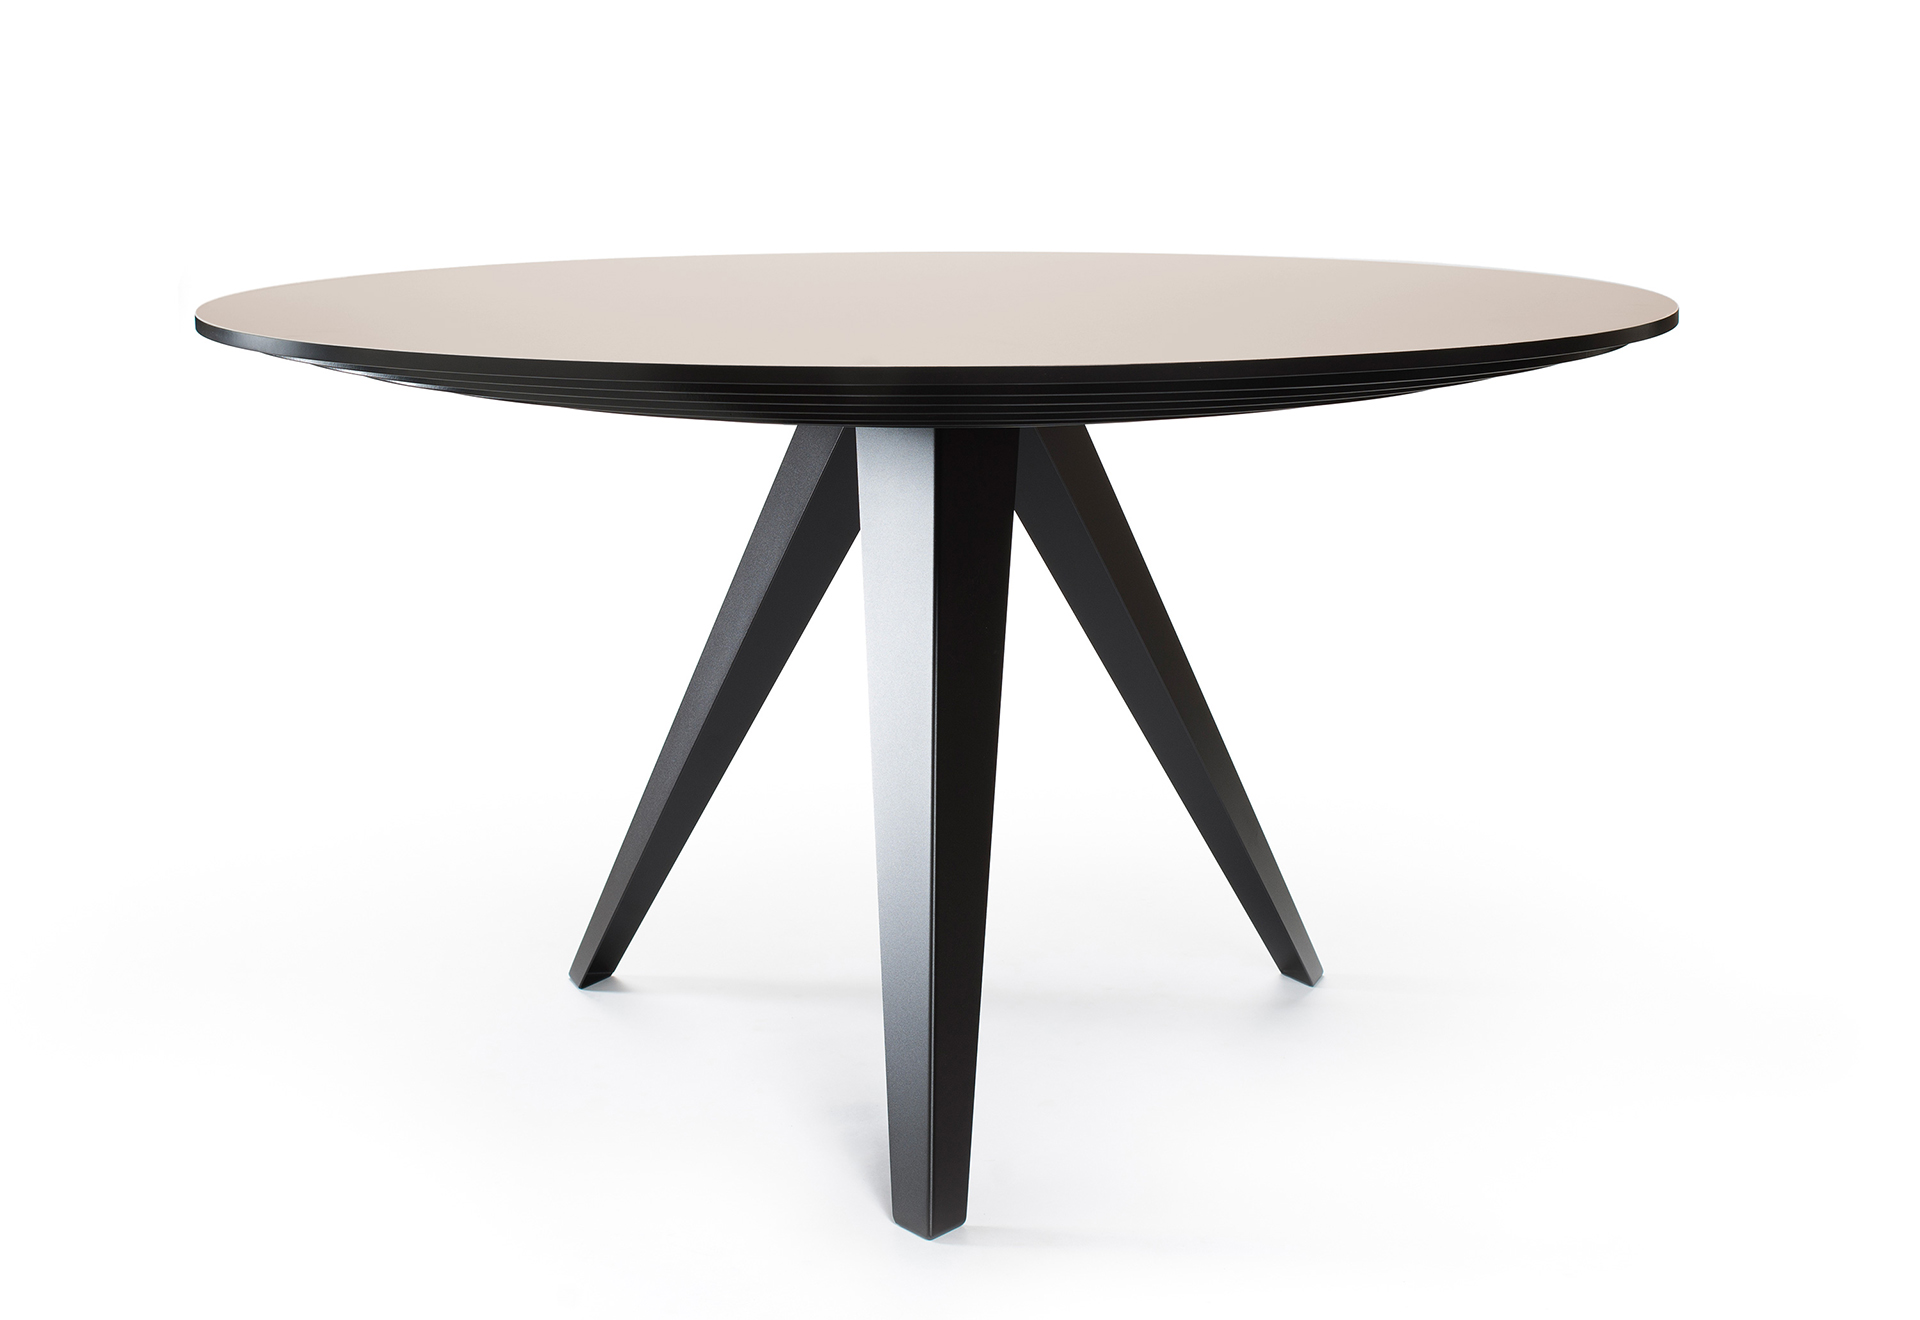 Ronde Eettafel 140.Ronde Eettafel Belly L Kees Marcelis L Odesi Your Dutch Design